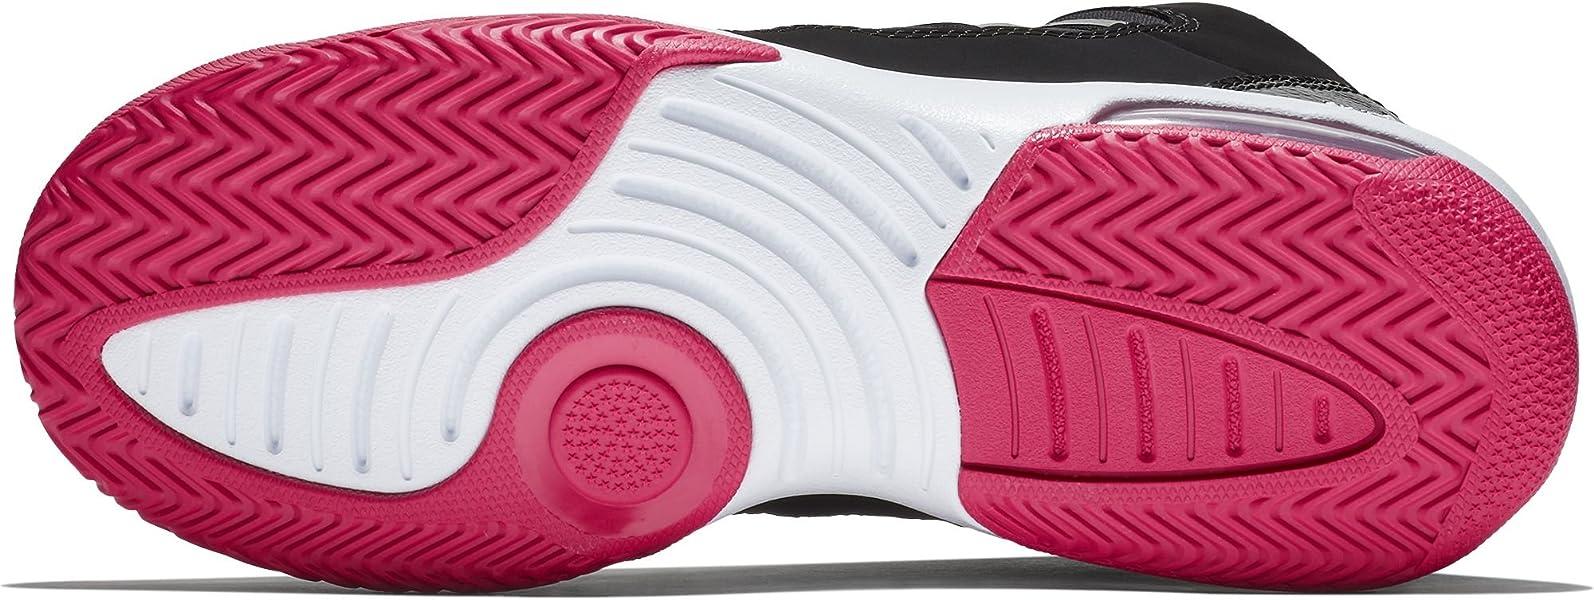 new styles 17c62 e9610 NIKE Jordan Girls Max Aura Girls Fashion-Sneakers AQ9249